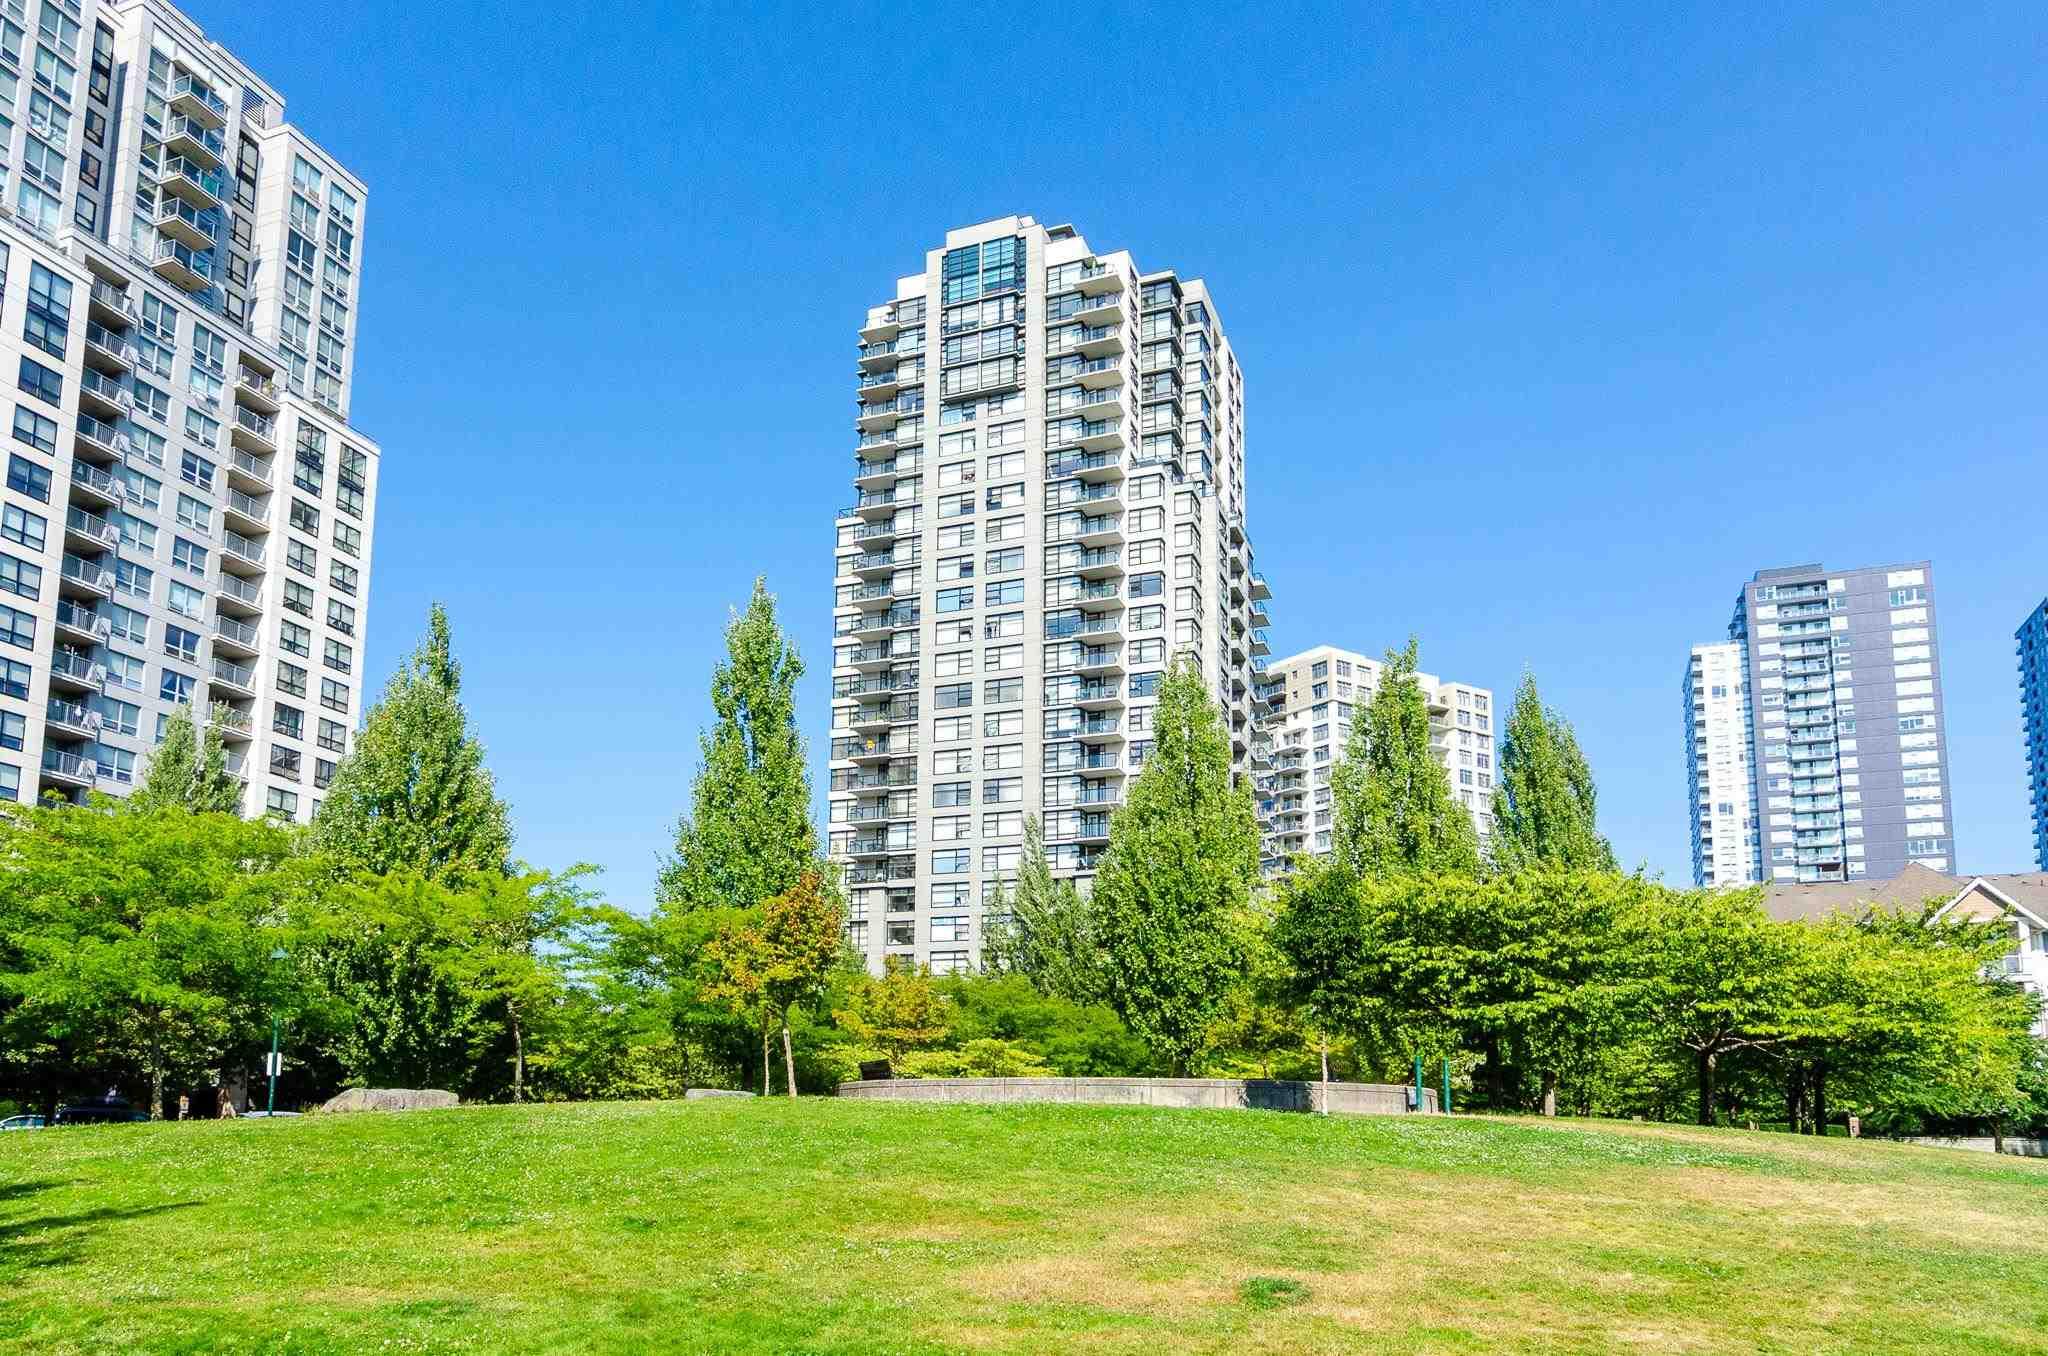 117 5380 OBEN STREET - Collingwood VE Apartment/Condo for sale, 1 Bedroom (R2605564) - #1